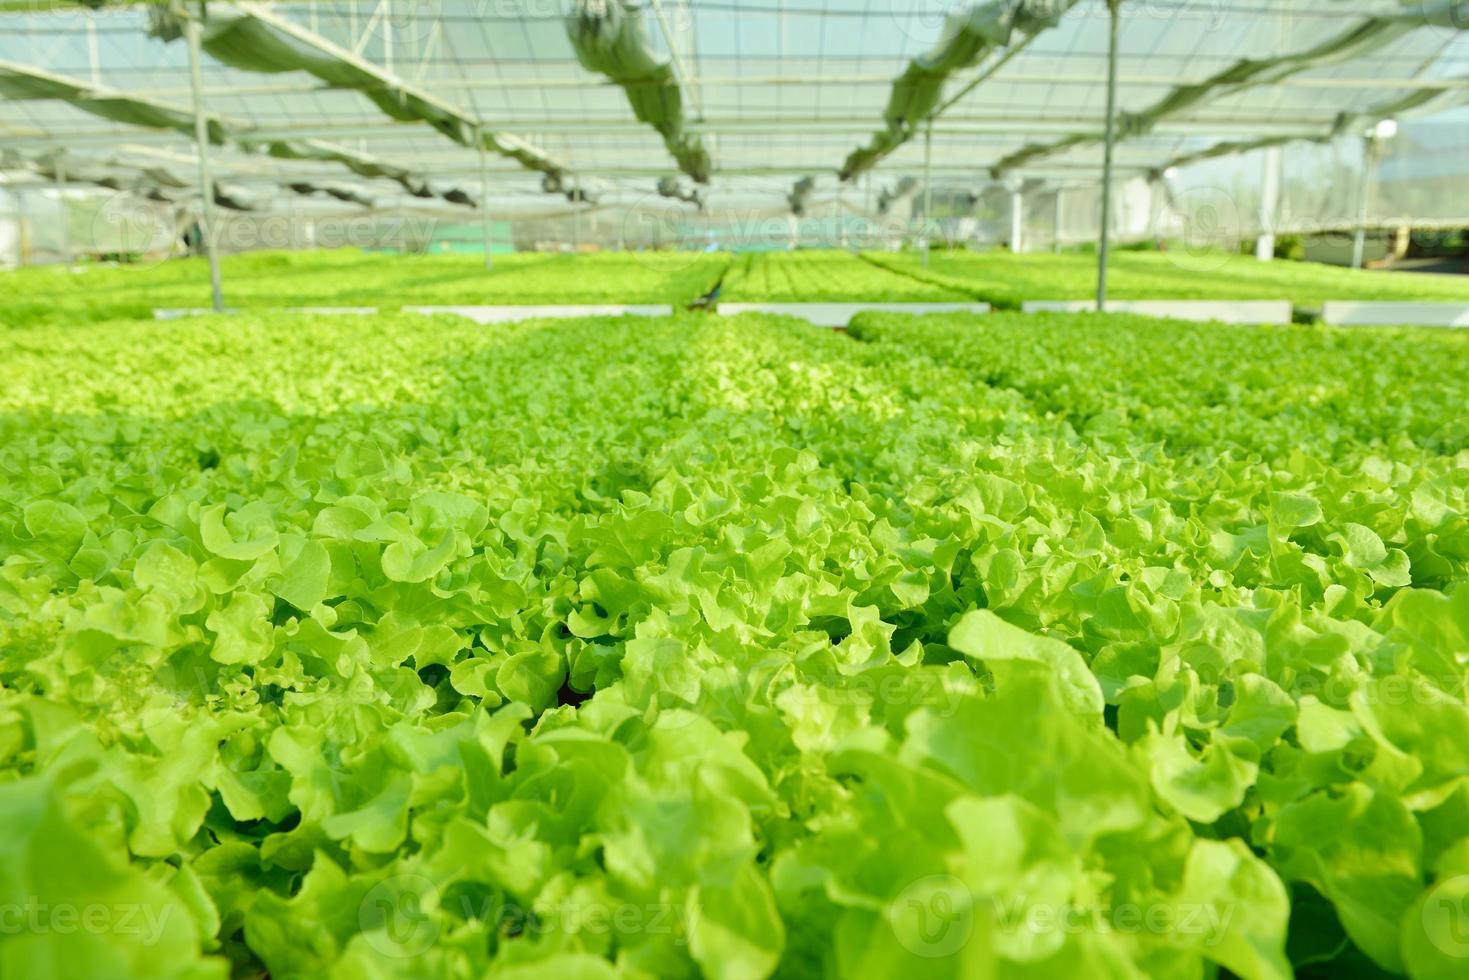 röd ek, grön ek, frillice isberg, odling hydroponic gr foto